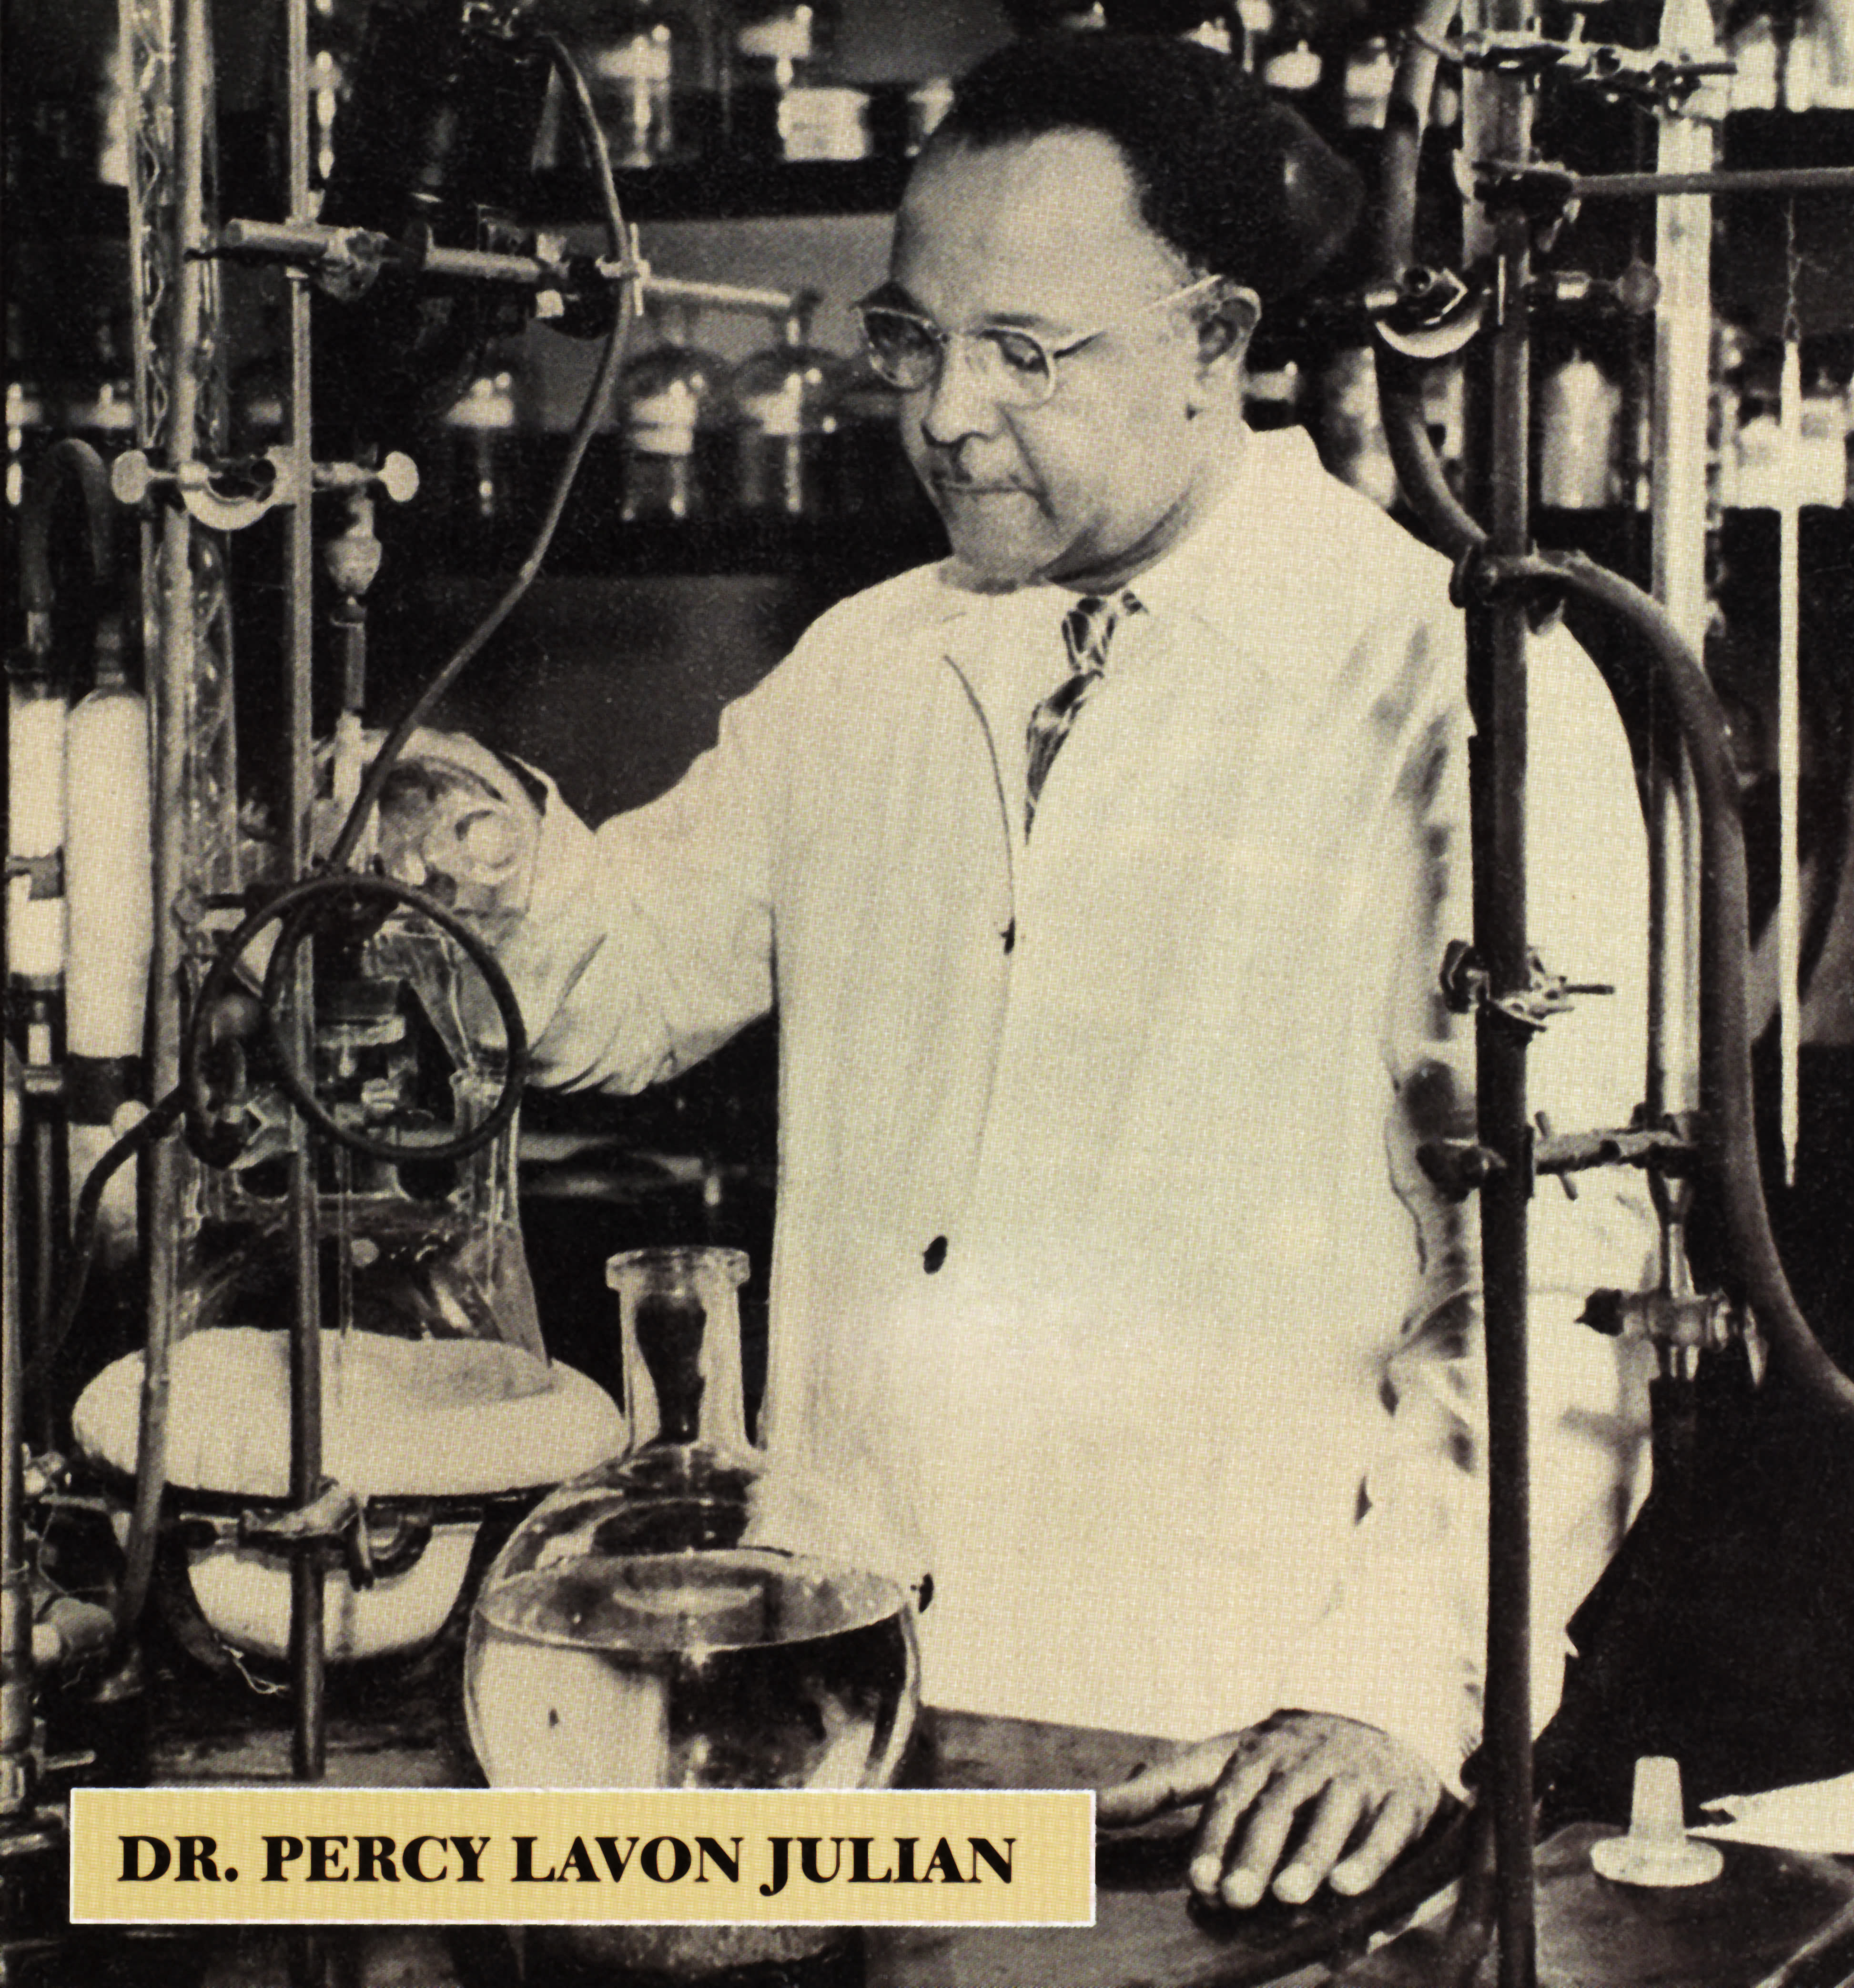 Dr. Percy Lavon Julian